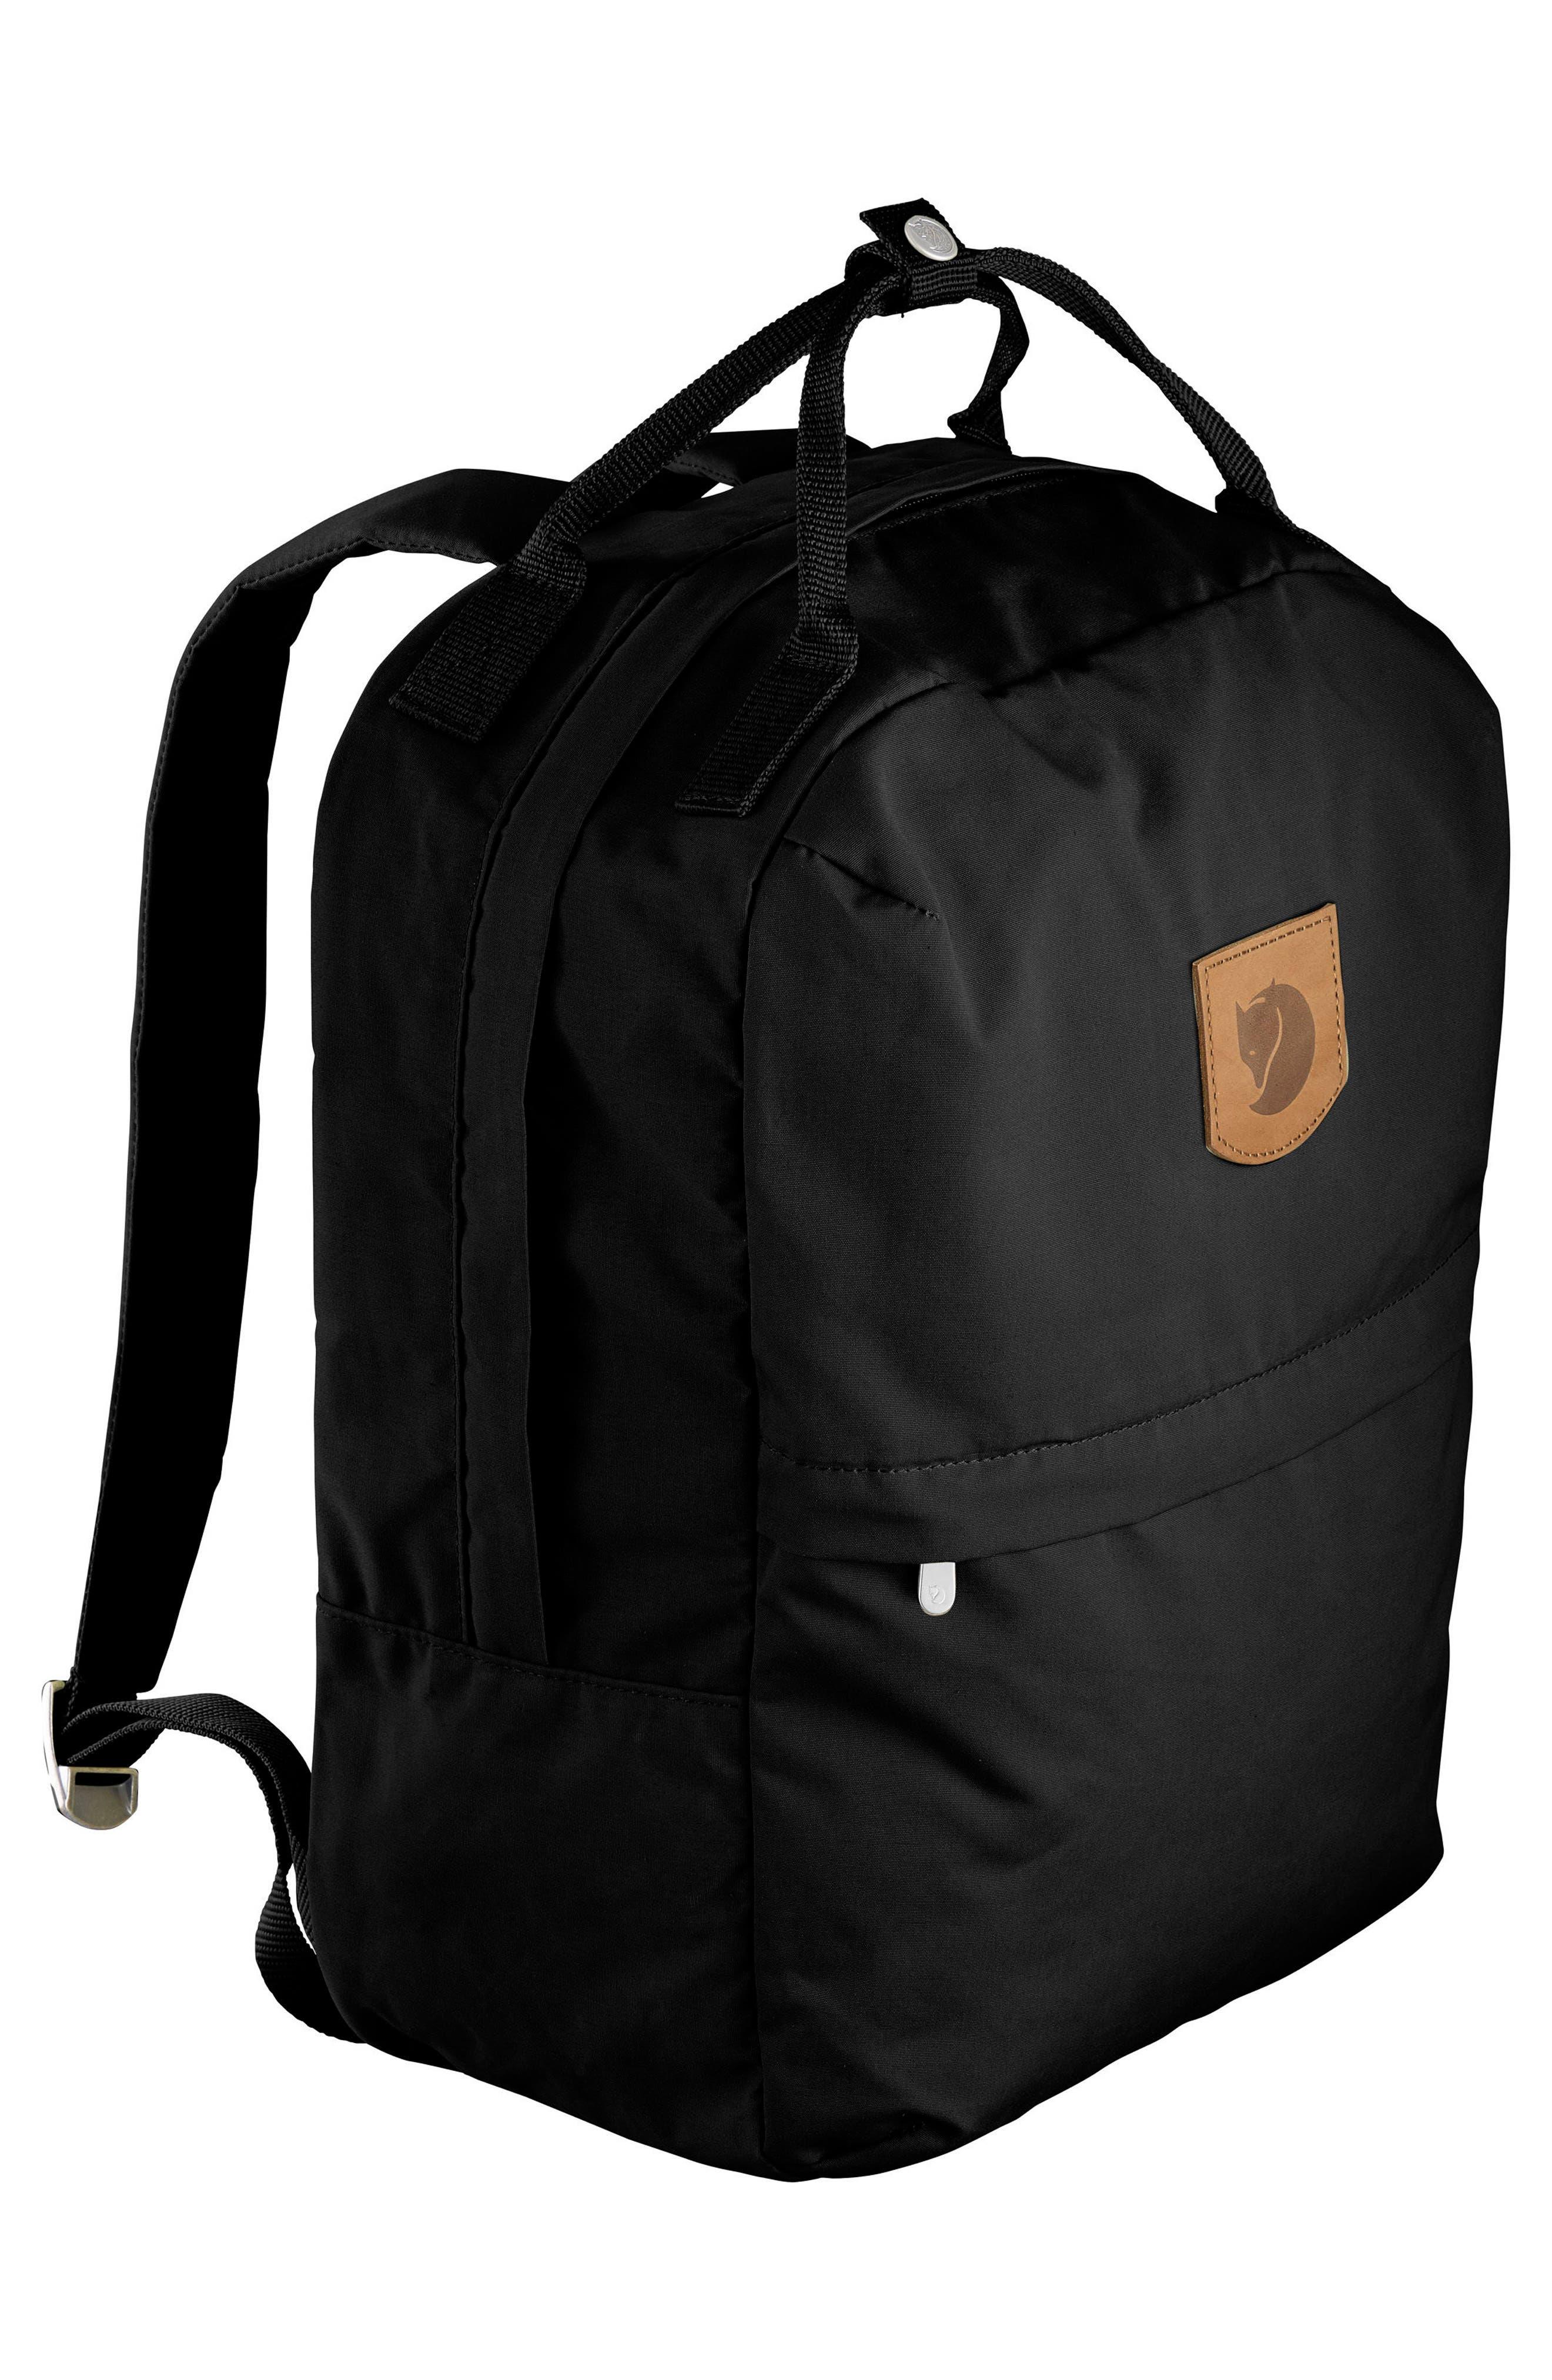 Greenland Backpack,                             Alternate thumbnail 2, color,                             BLACK